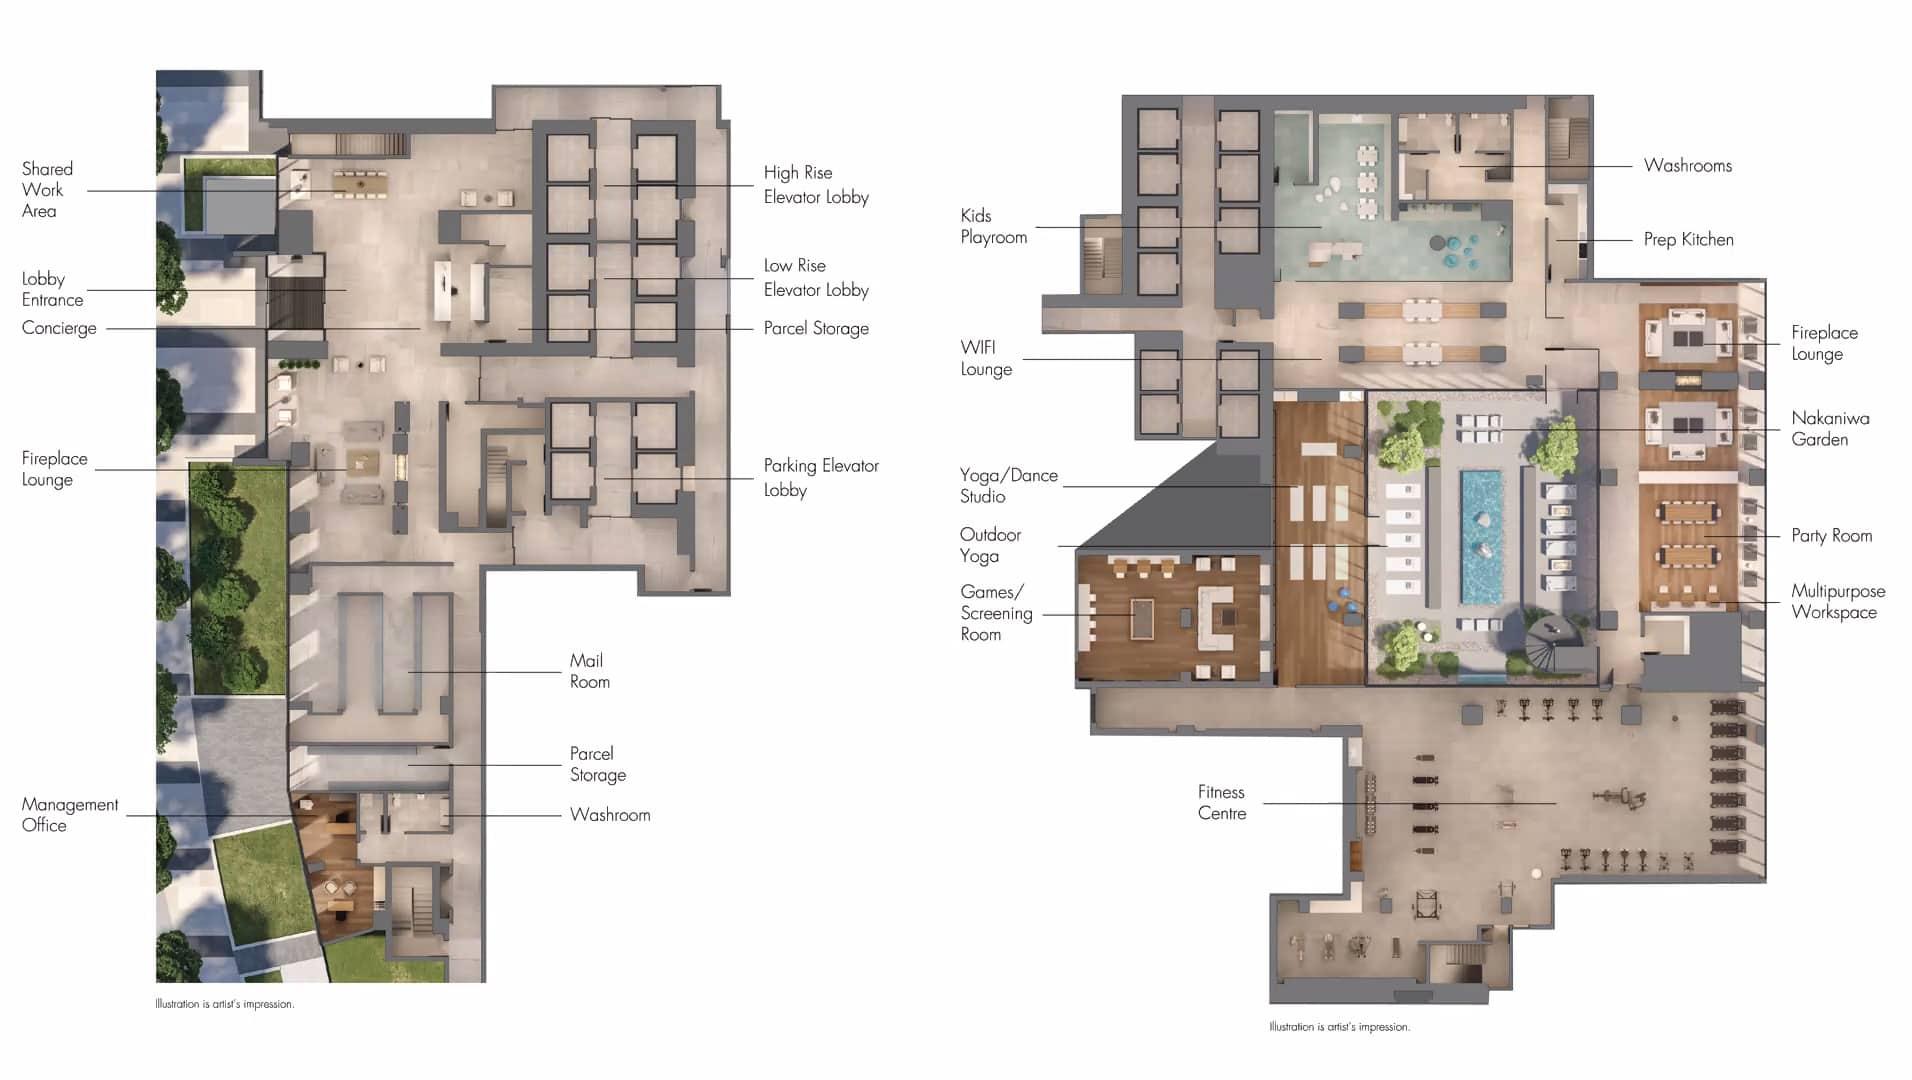 M4 Condos at M CITY Mississauga m4 condos for sale mississauga square one indoor amenities